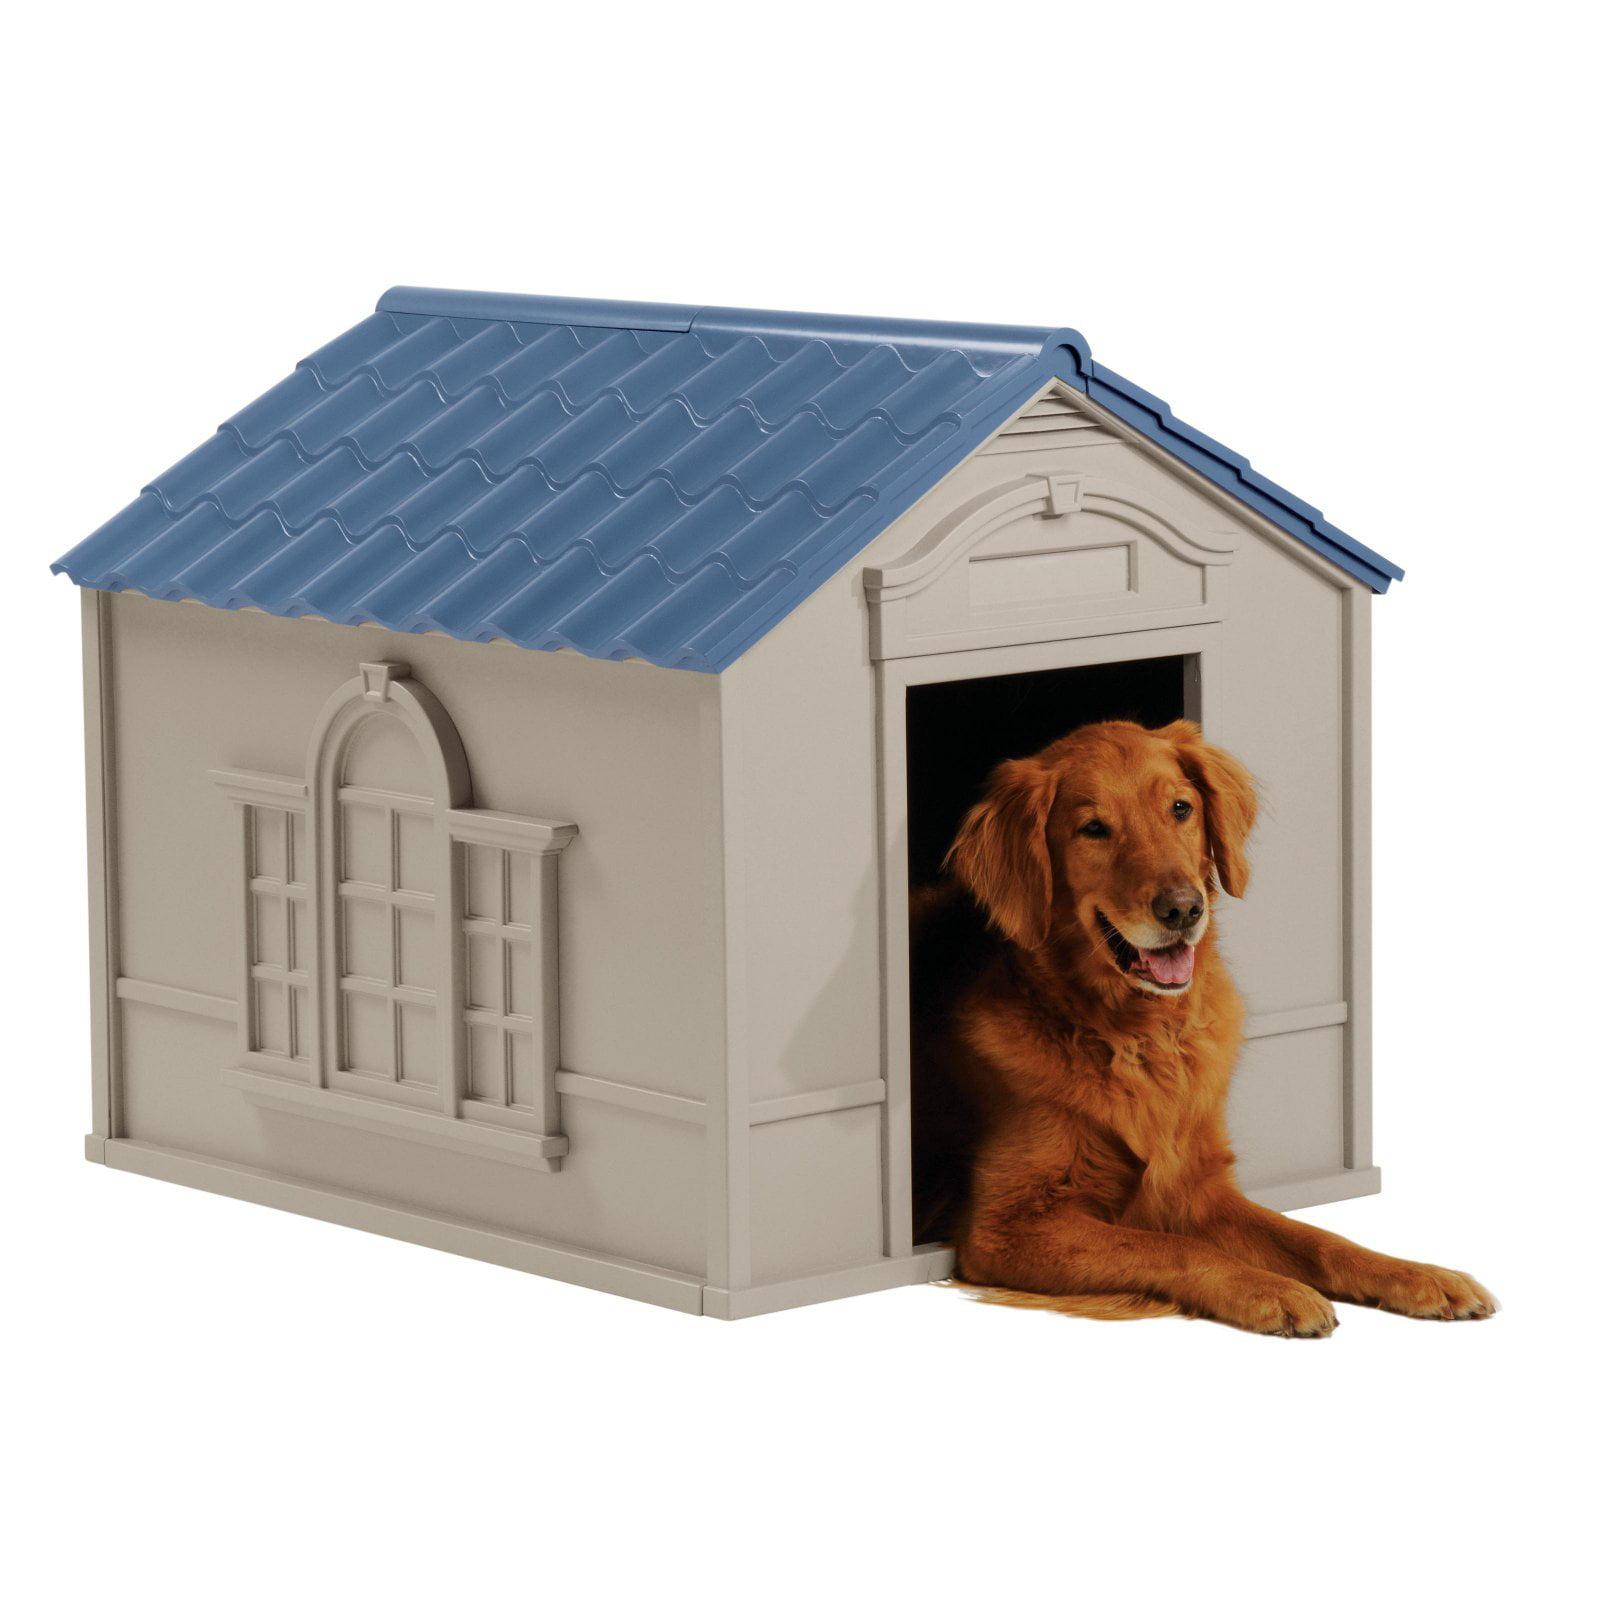 Suncast Deluxe Dog House, DH350